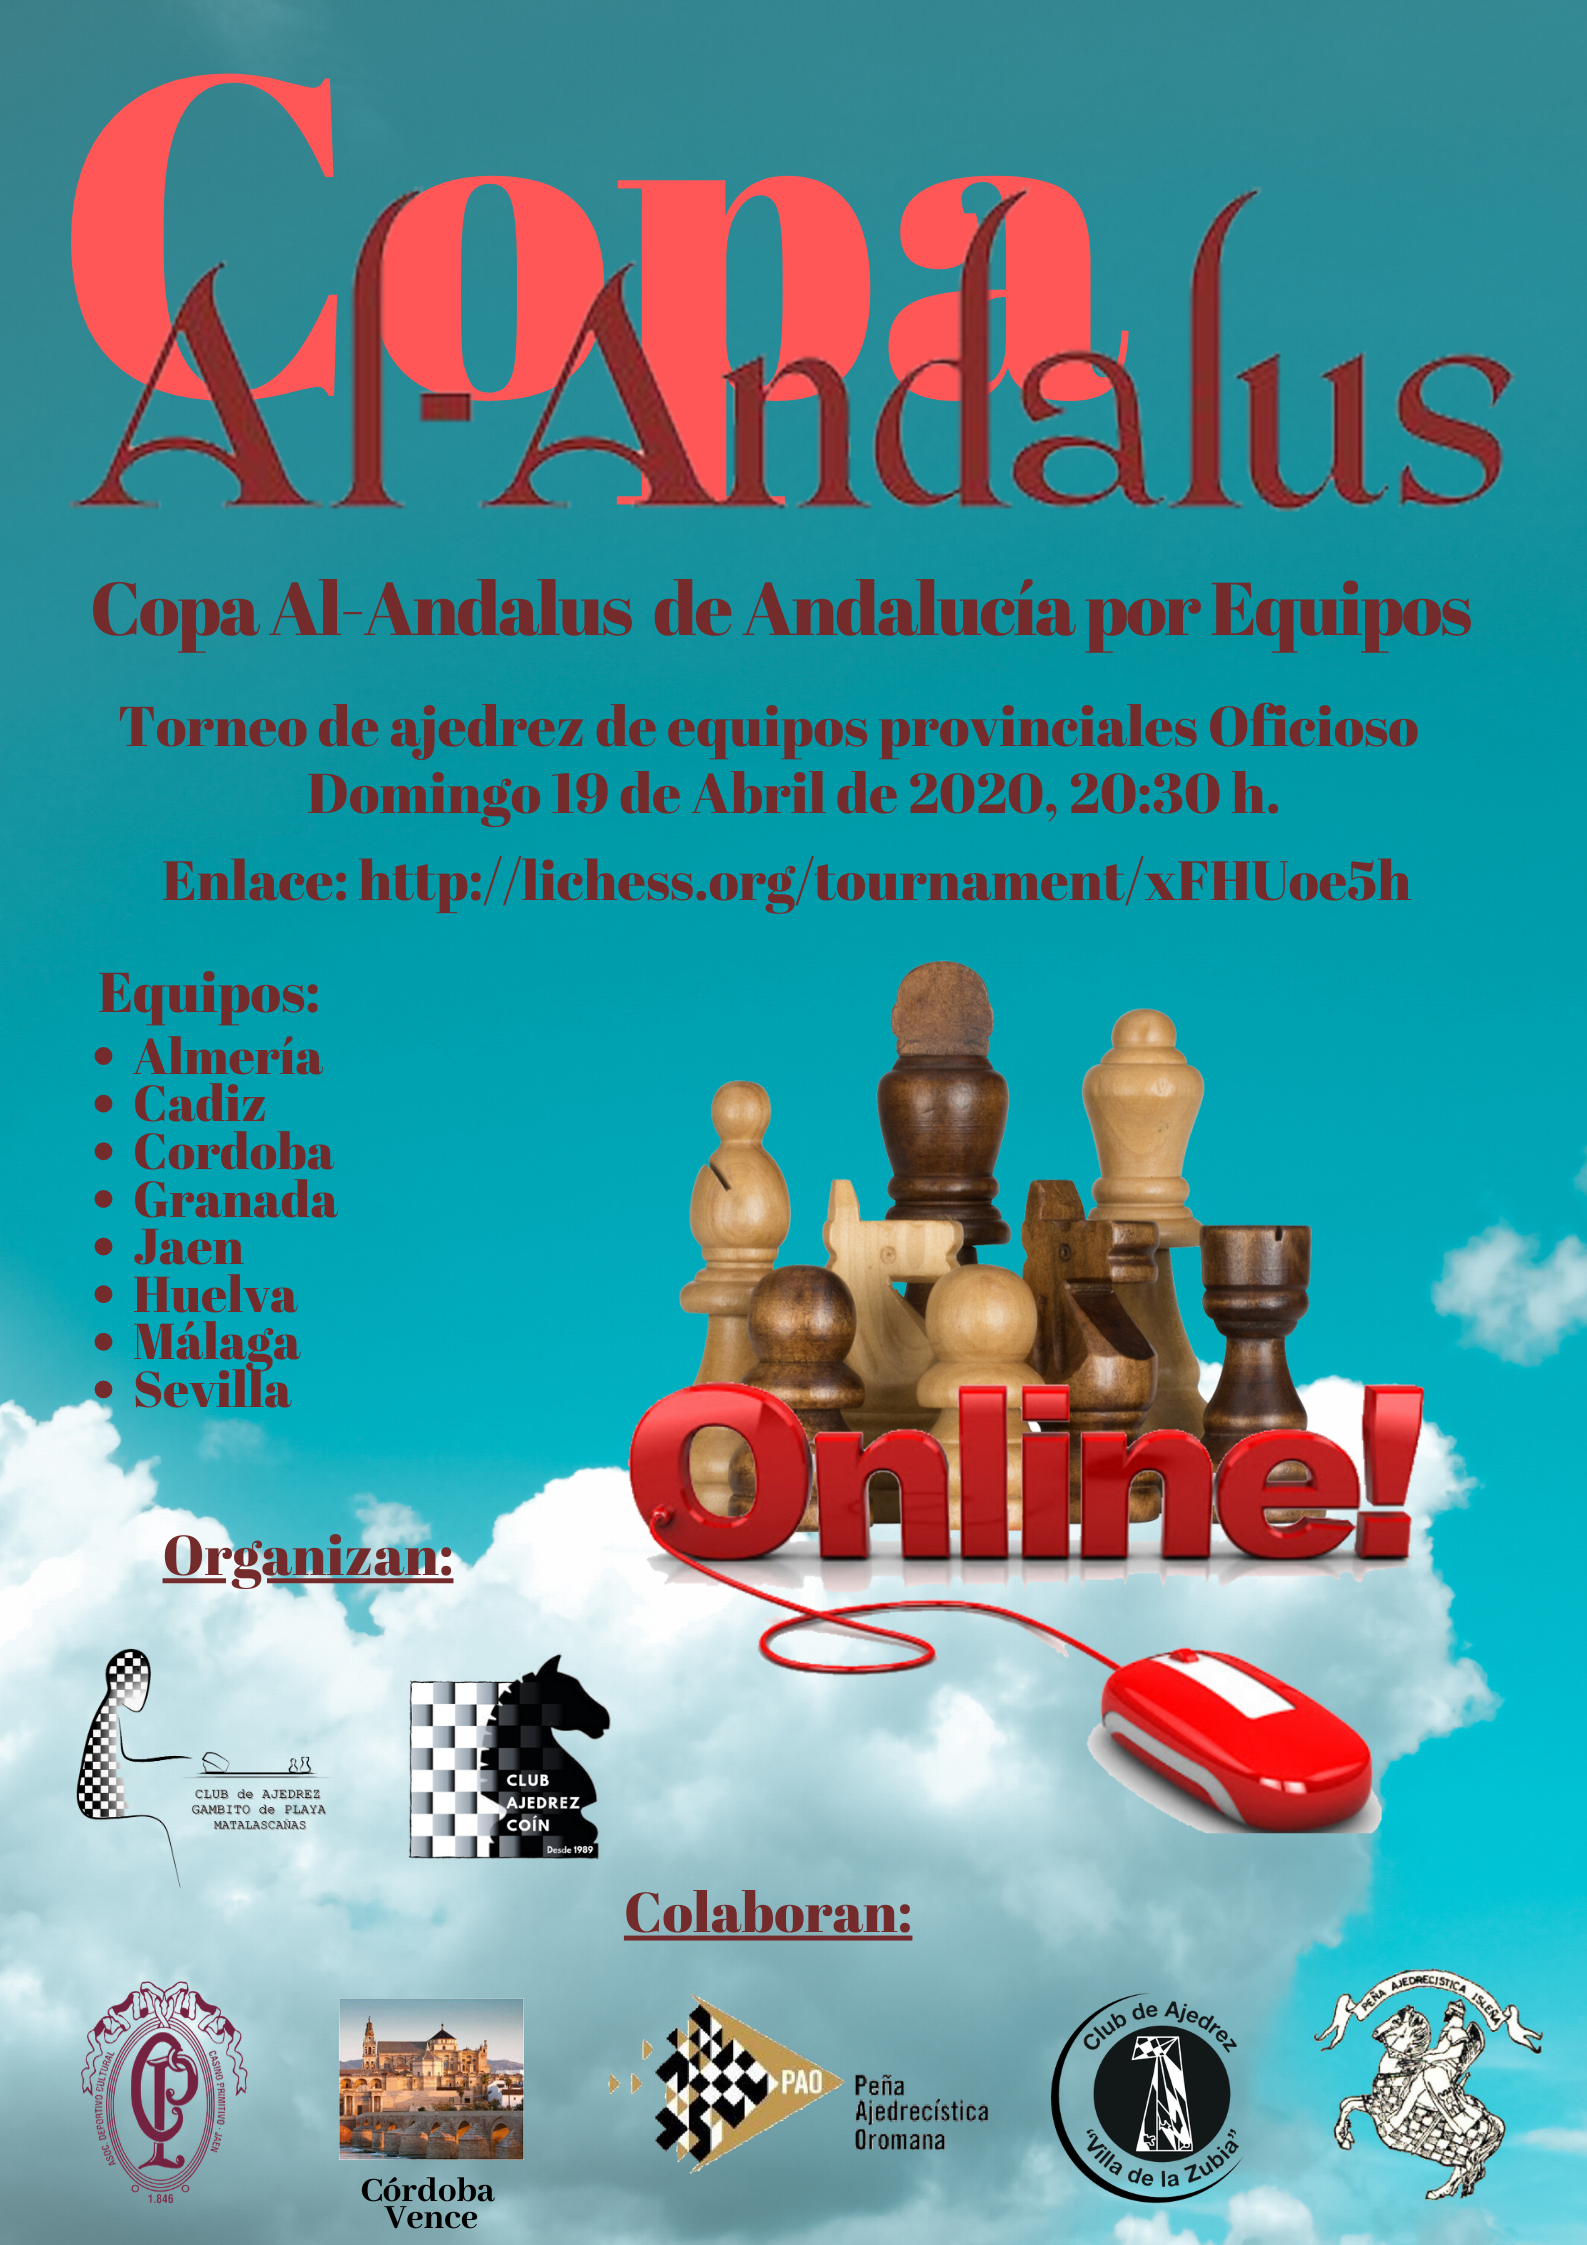 Copa Al-Andalus